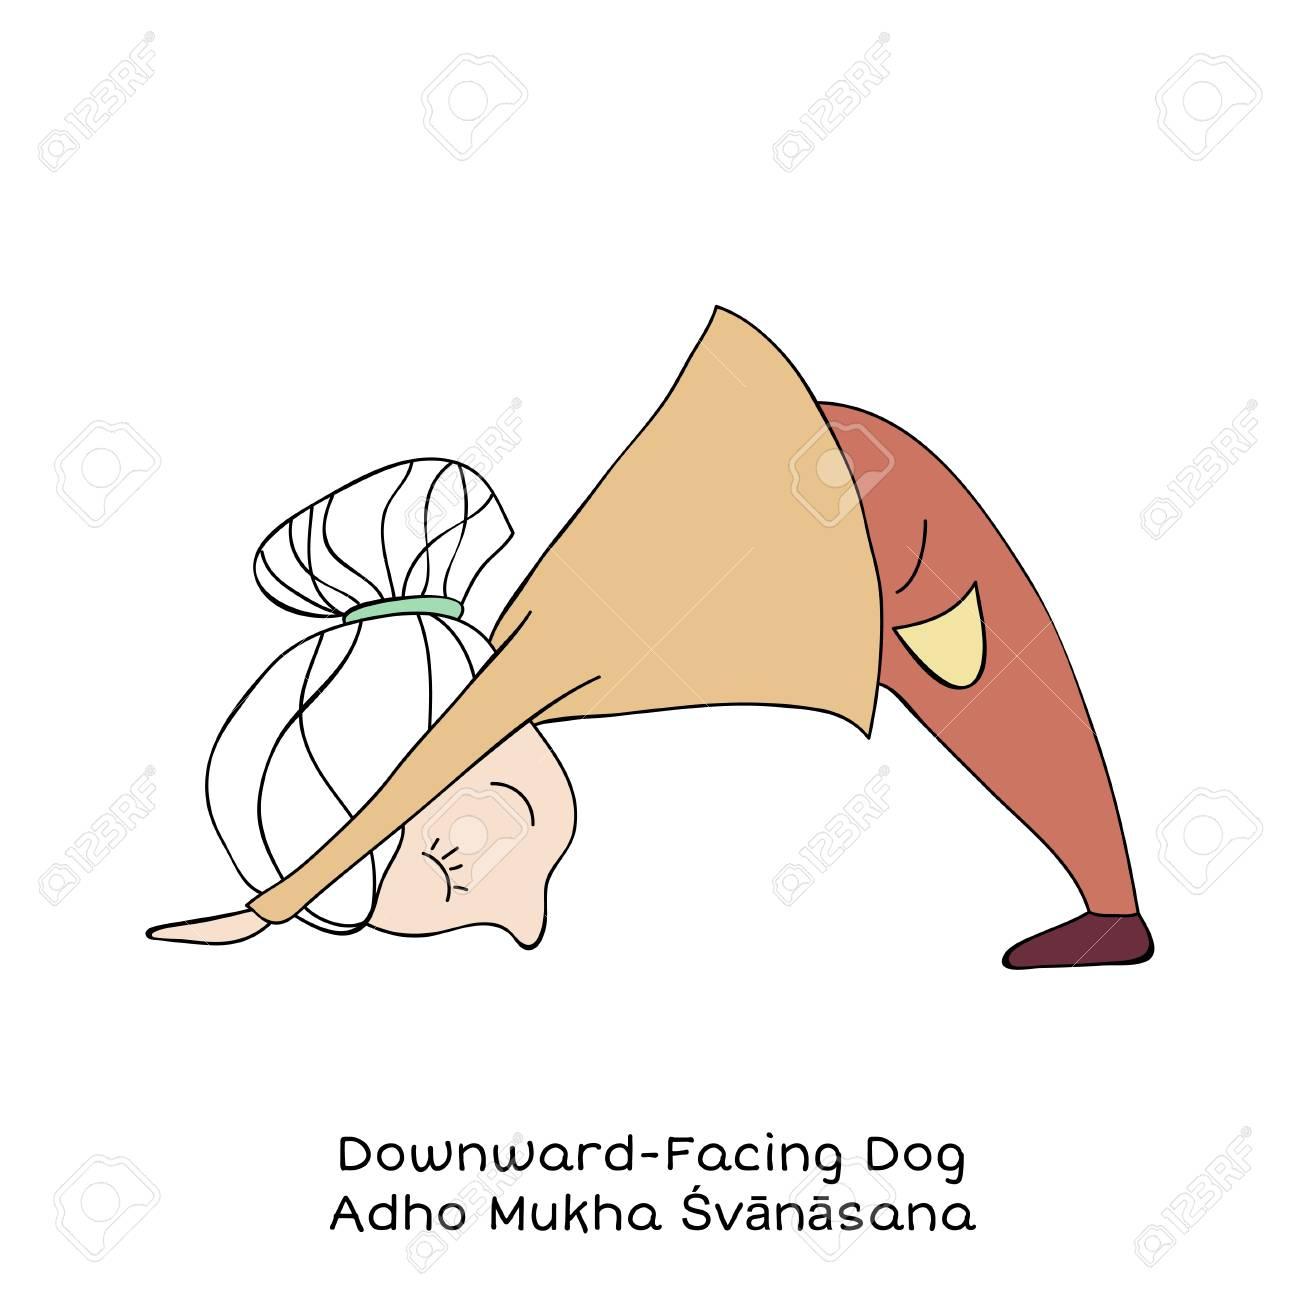 Downward Dog Yoga Cartoon